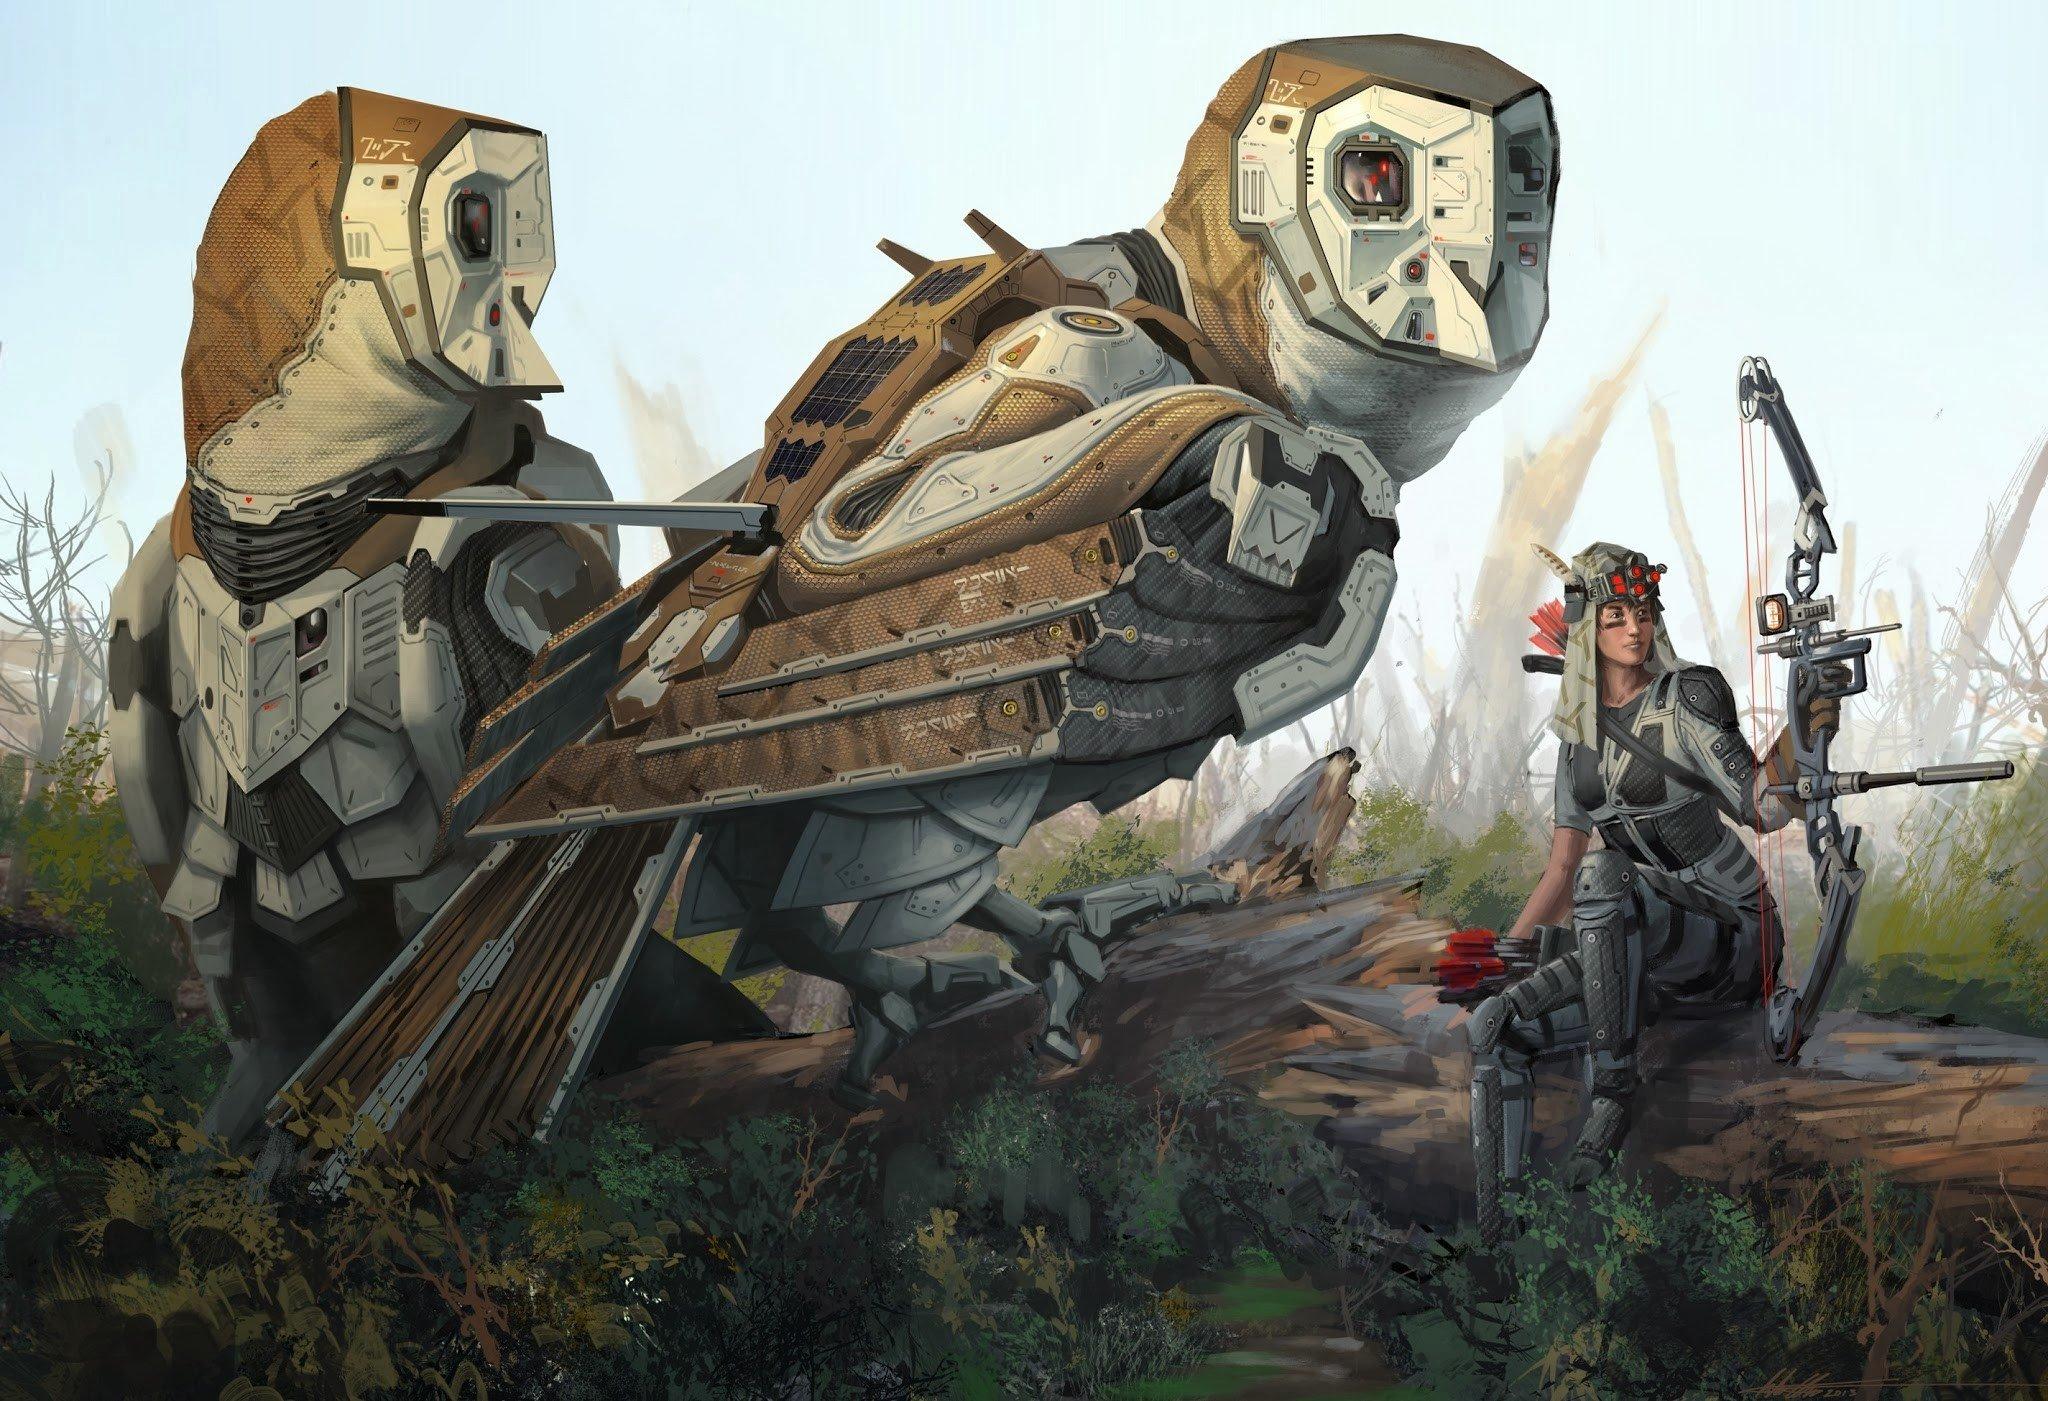 Wallpaper 2048x1401 Px Busur Futuristik Burung Hantu Robot